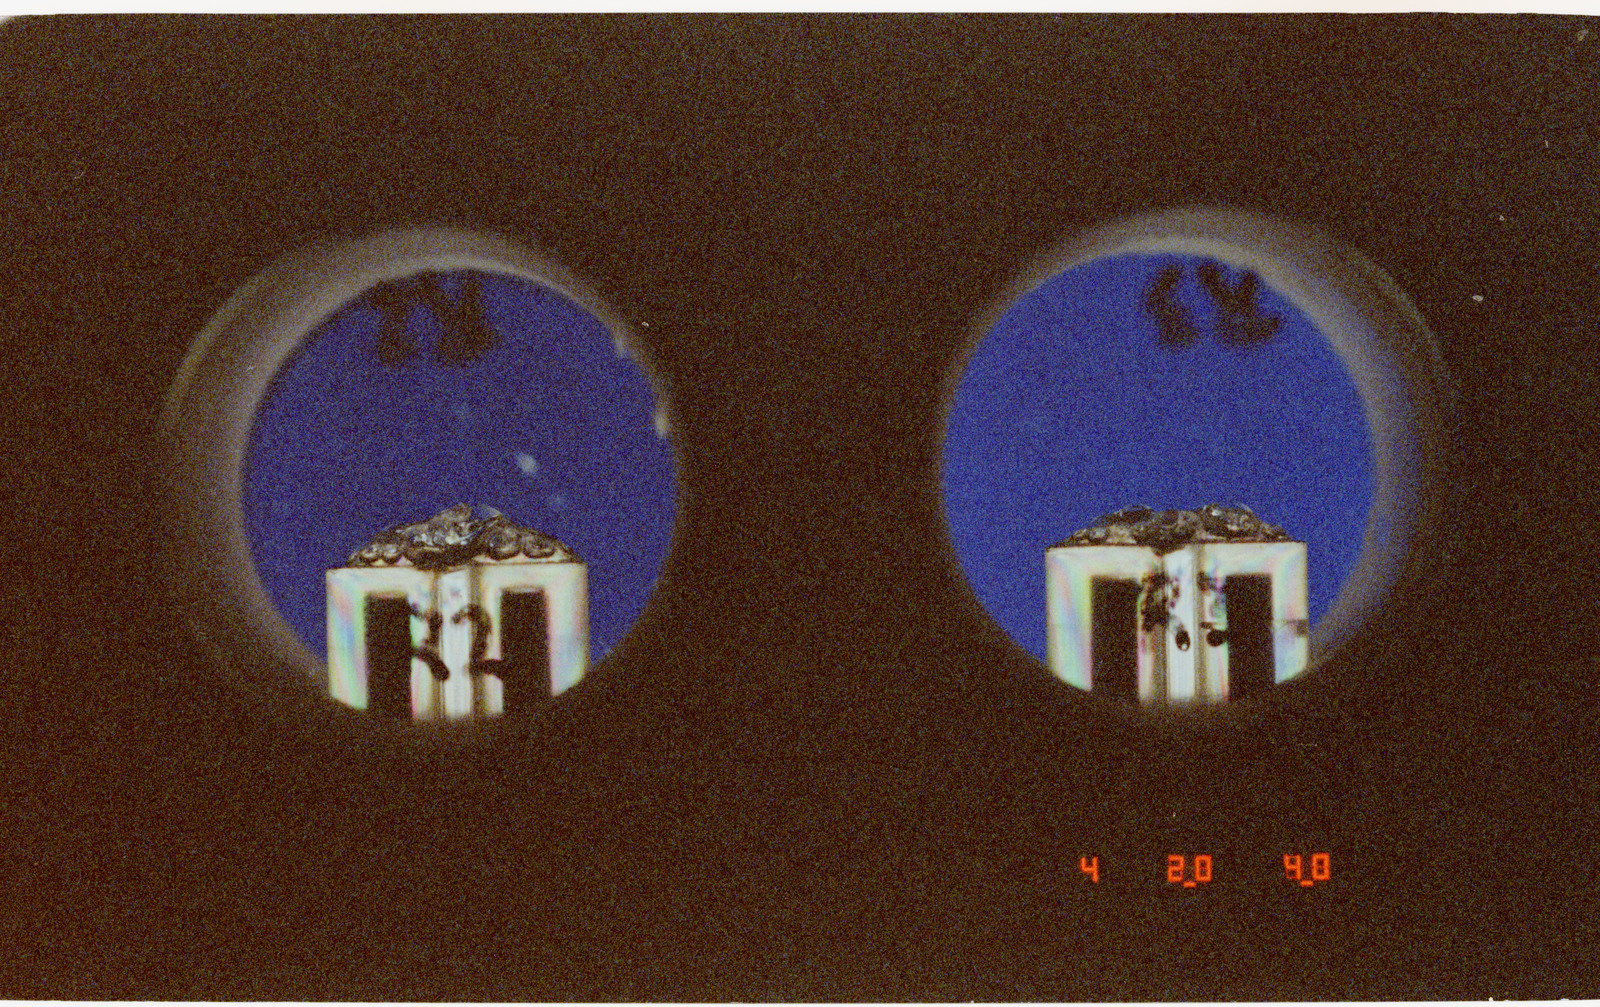 S42-248-027 - STS-042 - Spaceborne experiment